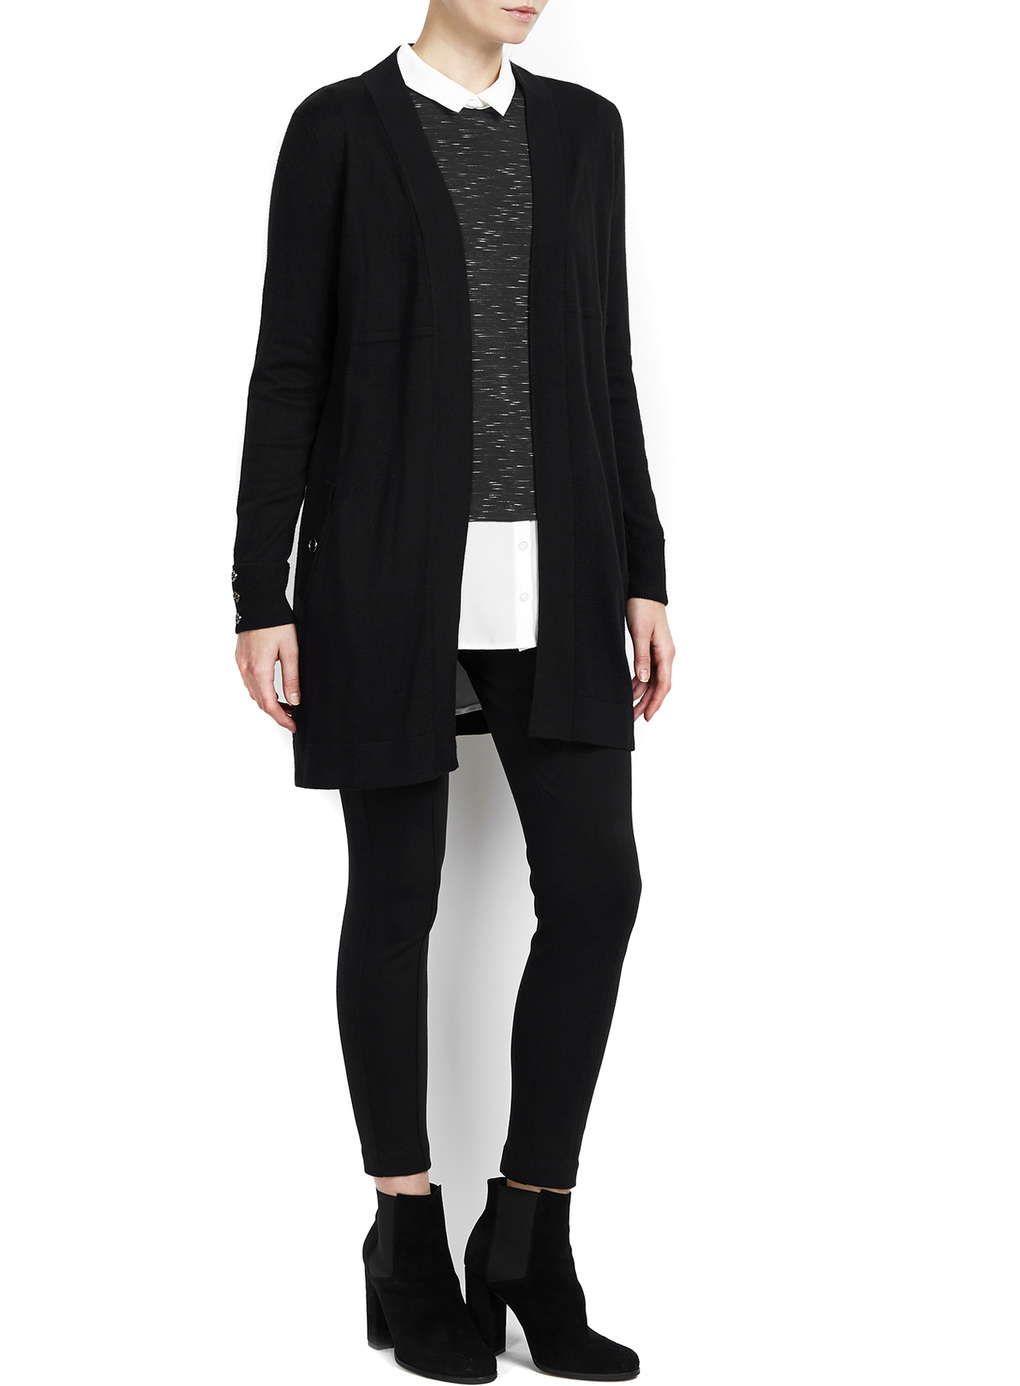 Wallis Petite Black Longline Cardigan | блузы, топы | Pinterest ...